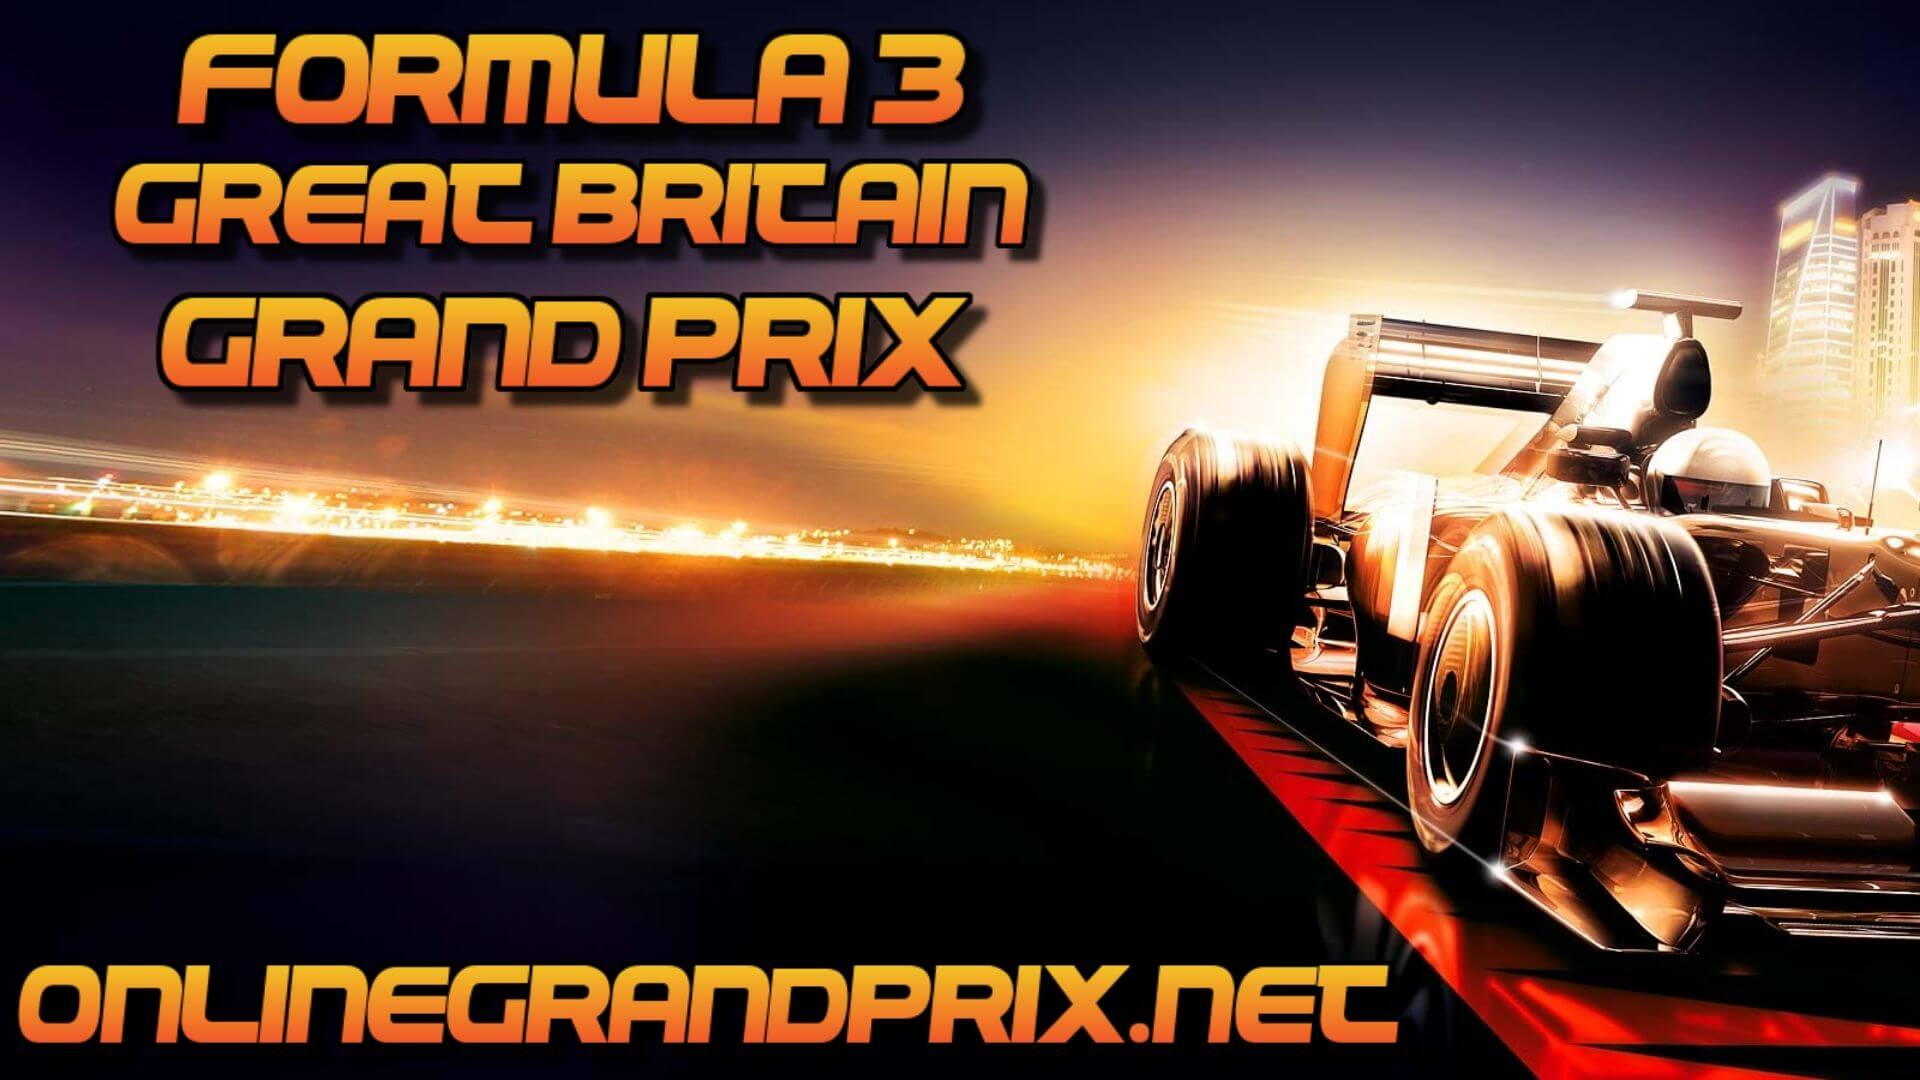 Great Britain F3 Grand Prix Live Stream 2020 | Race 2: Full Race Replay